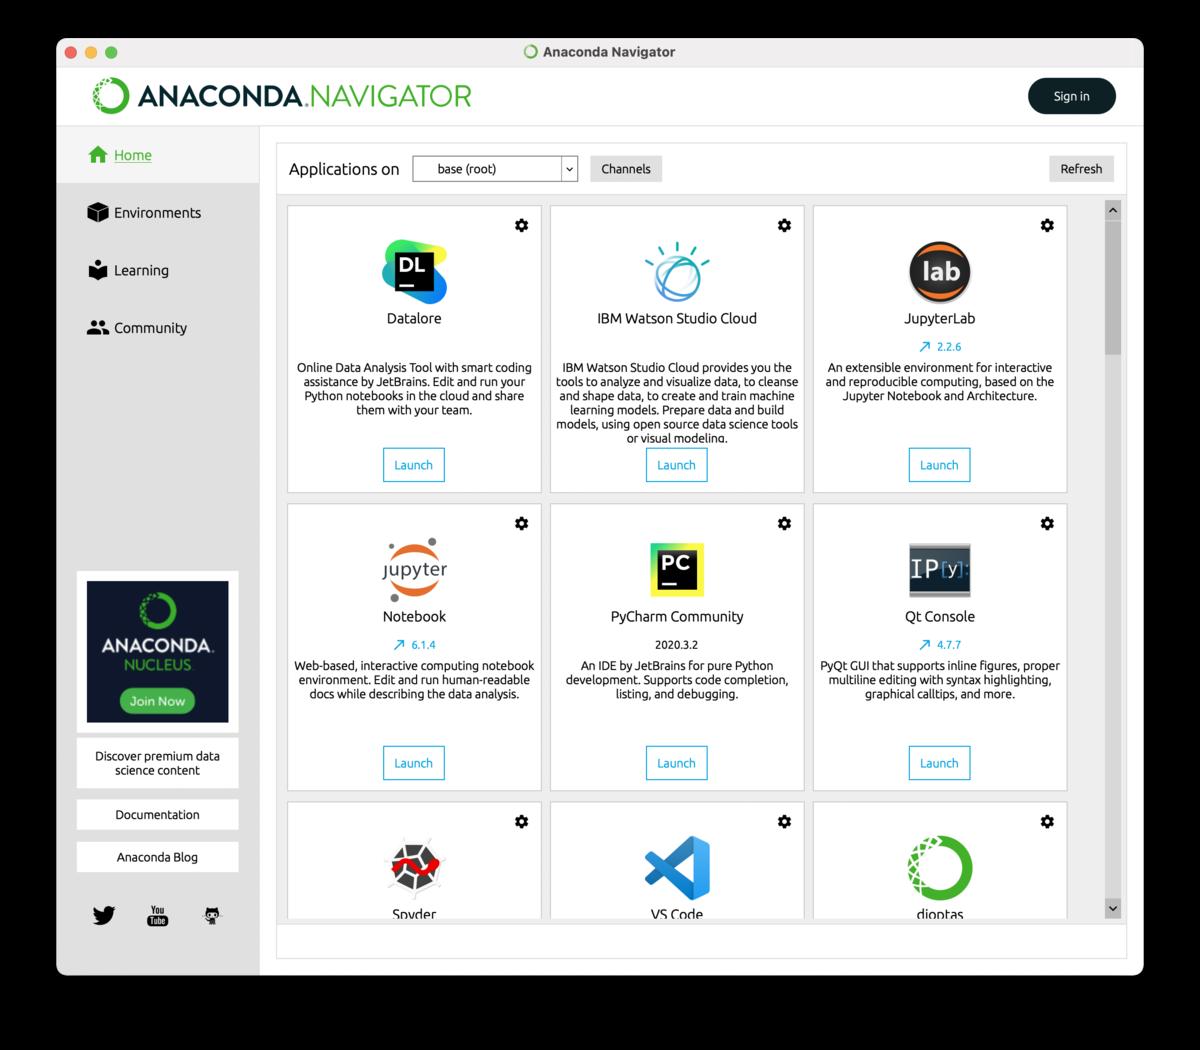 Anaconda-Navigatorの初期画面